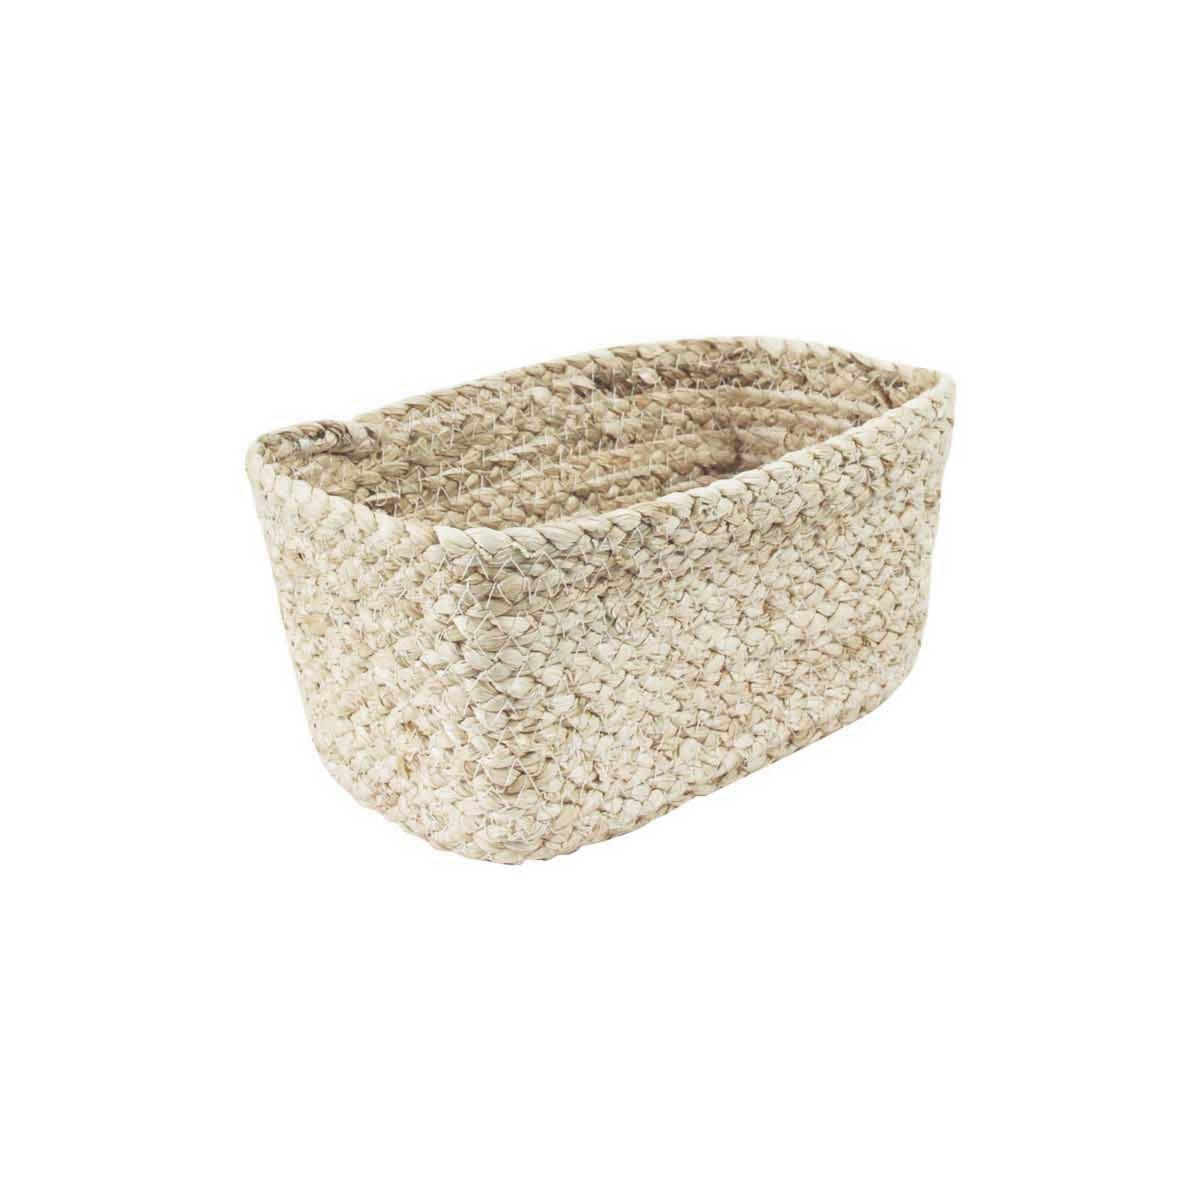 Panier de rangement en fibre naturelle rectangulaire for Panier rangement salle de bain